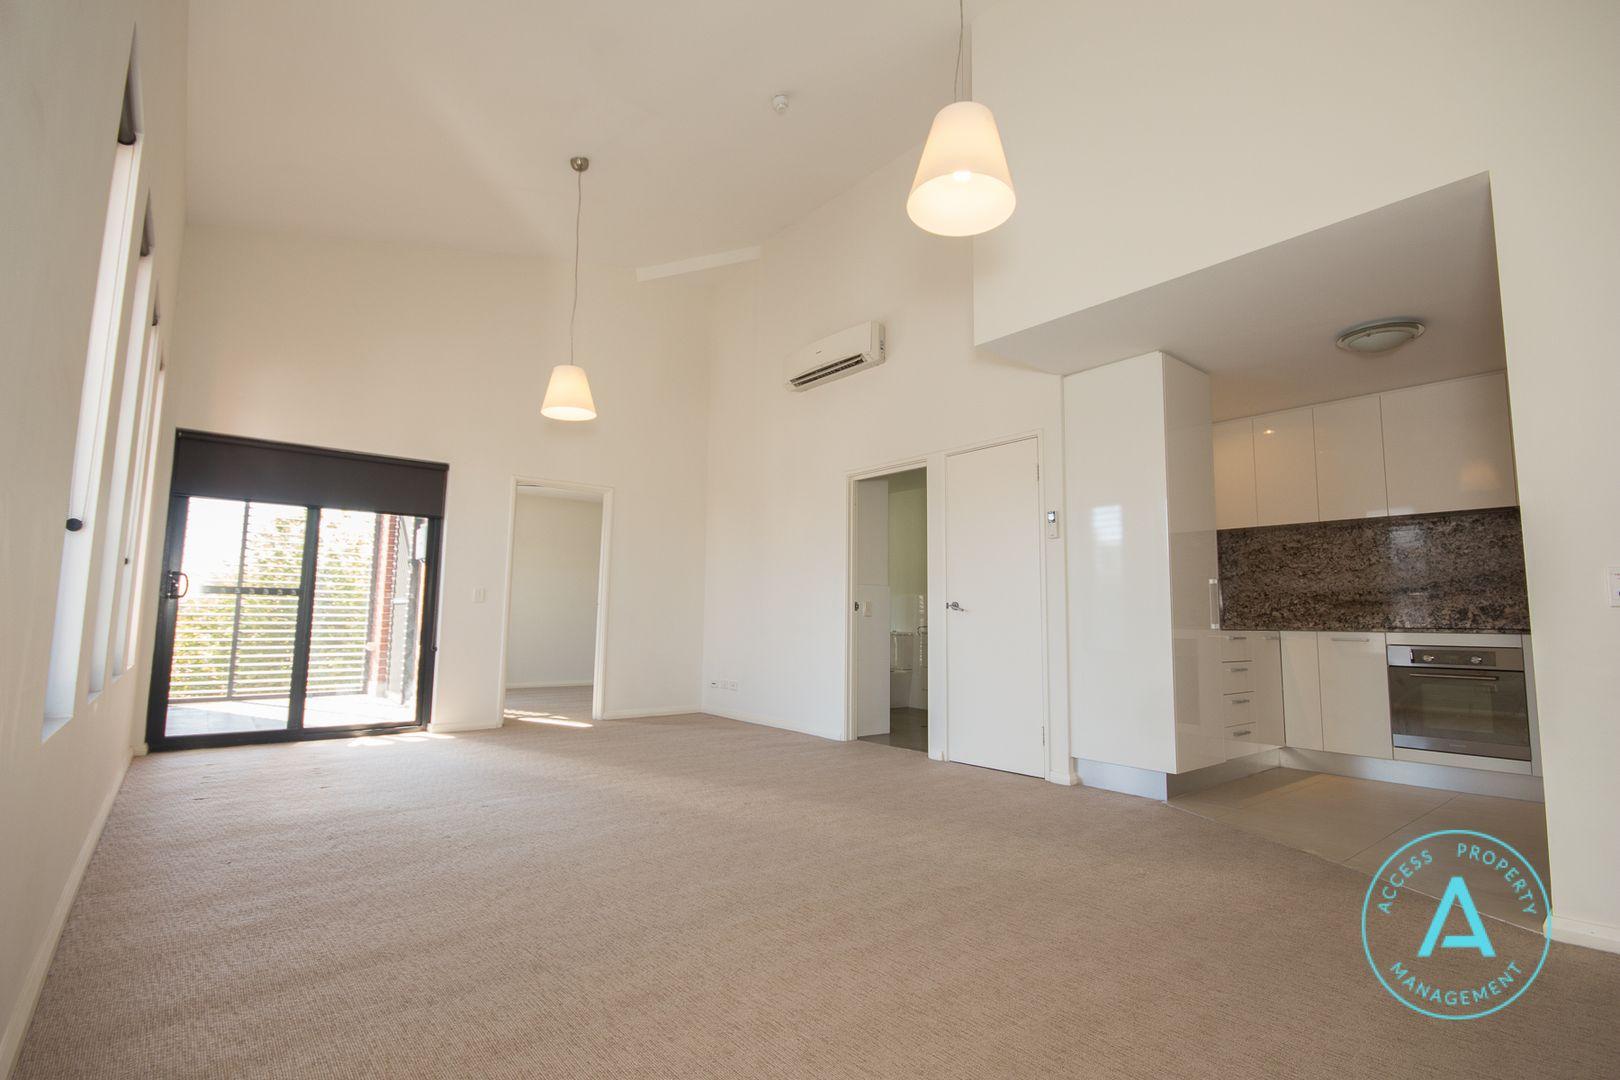 1 bedrooms Apartment / Unit / Flat in 32/14 Money Street PERTH WA, 6000